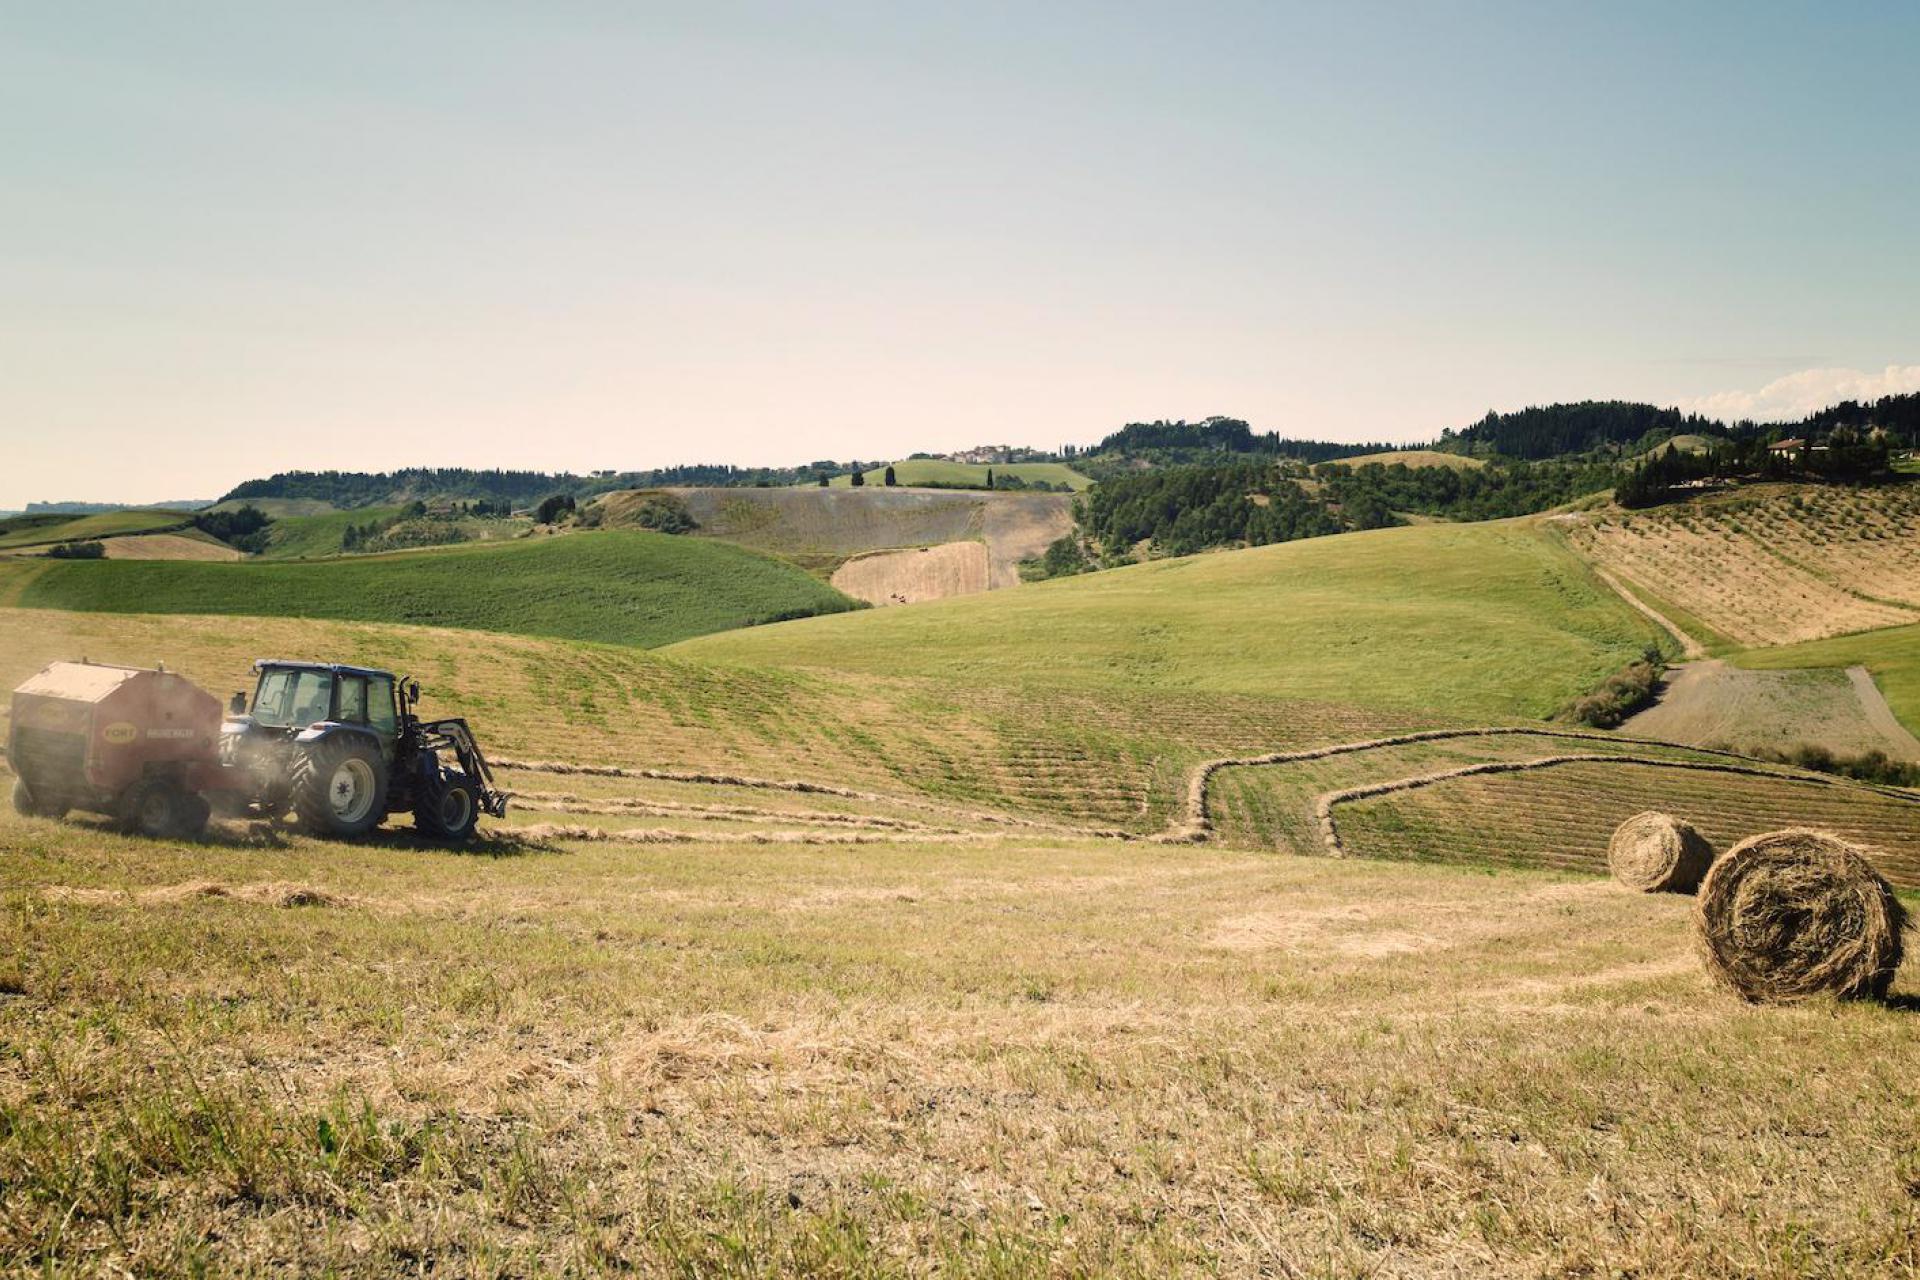 Agriturismo Toscane Klassieke agriturismo in landhuis Toscane | myitaly.nl